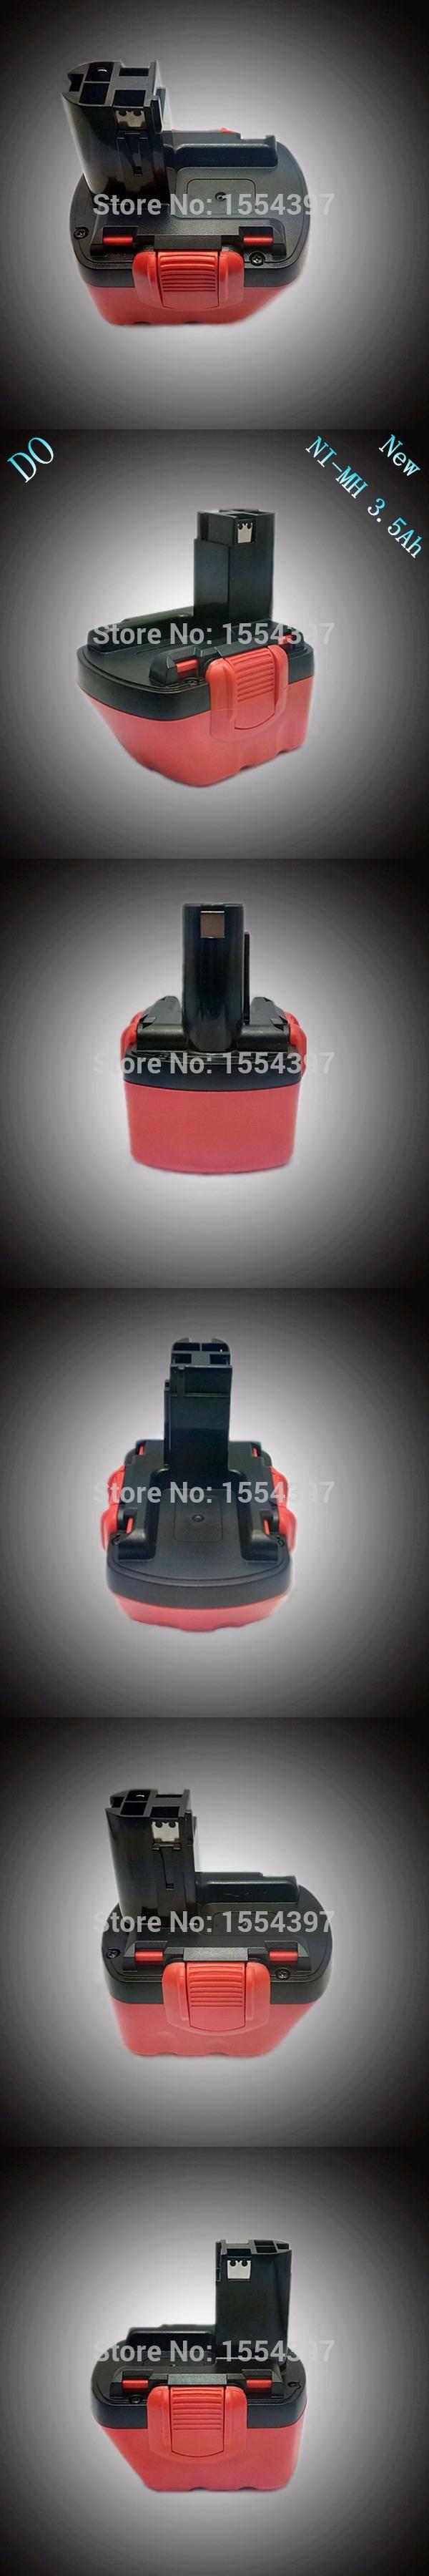 Sale 12V  3500mAh Ni-MH Rechargeable Power Tool Battery Replacement for Bosch 12V BAT139 BAT043 BAT045 BAT046 BAT049 BAT120